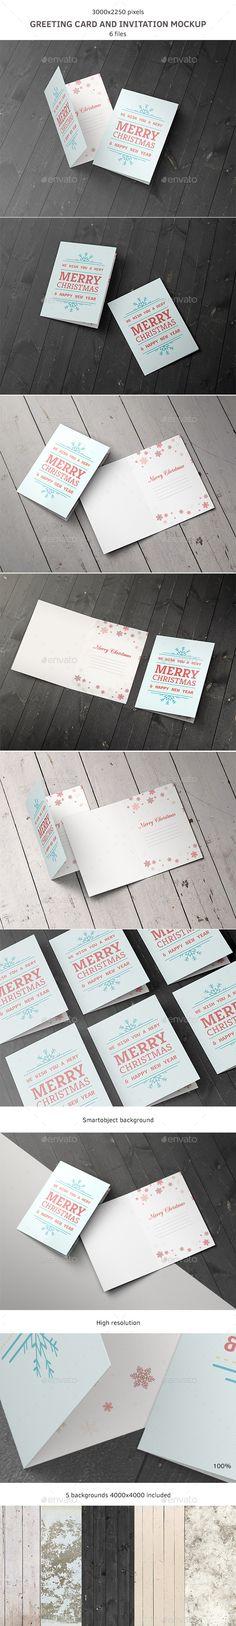 Greeting Card and Invitation Mockup   #cardmockup #invitationmockup   Download: http://graphicriver.net/item/greeting-card-and-invitation-mockup/9242599?ref=ksioks